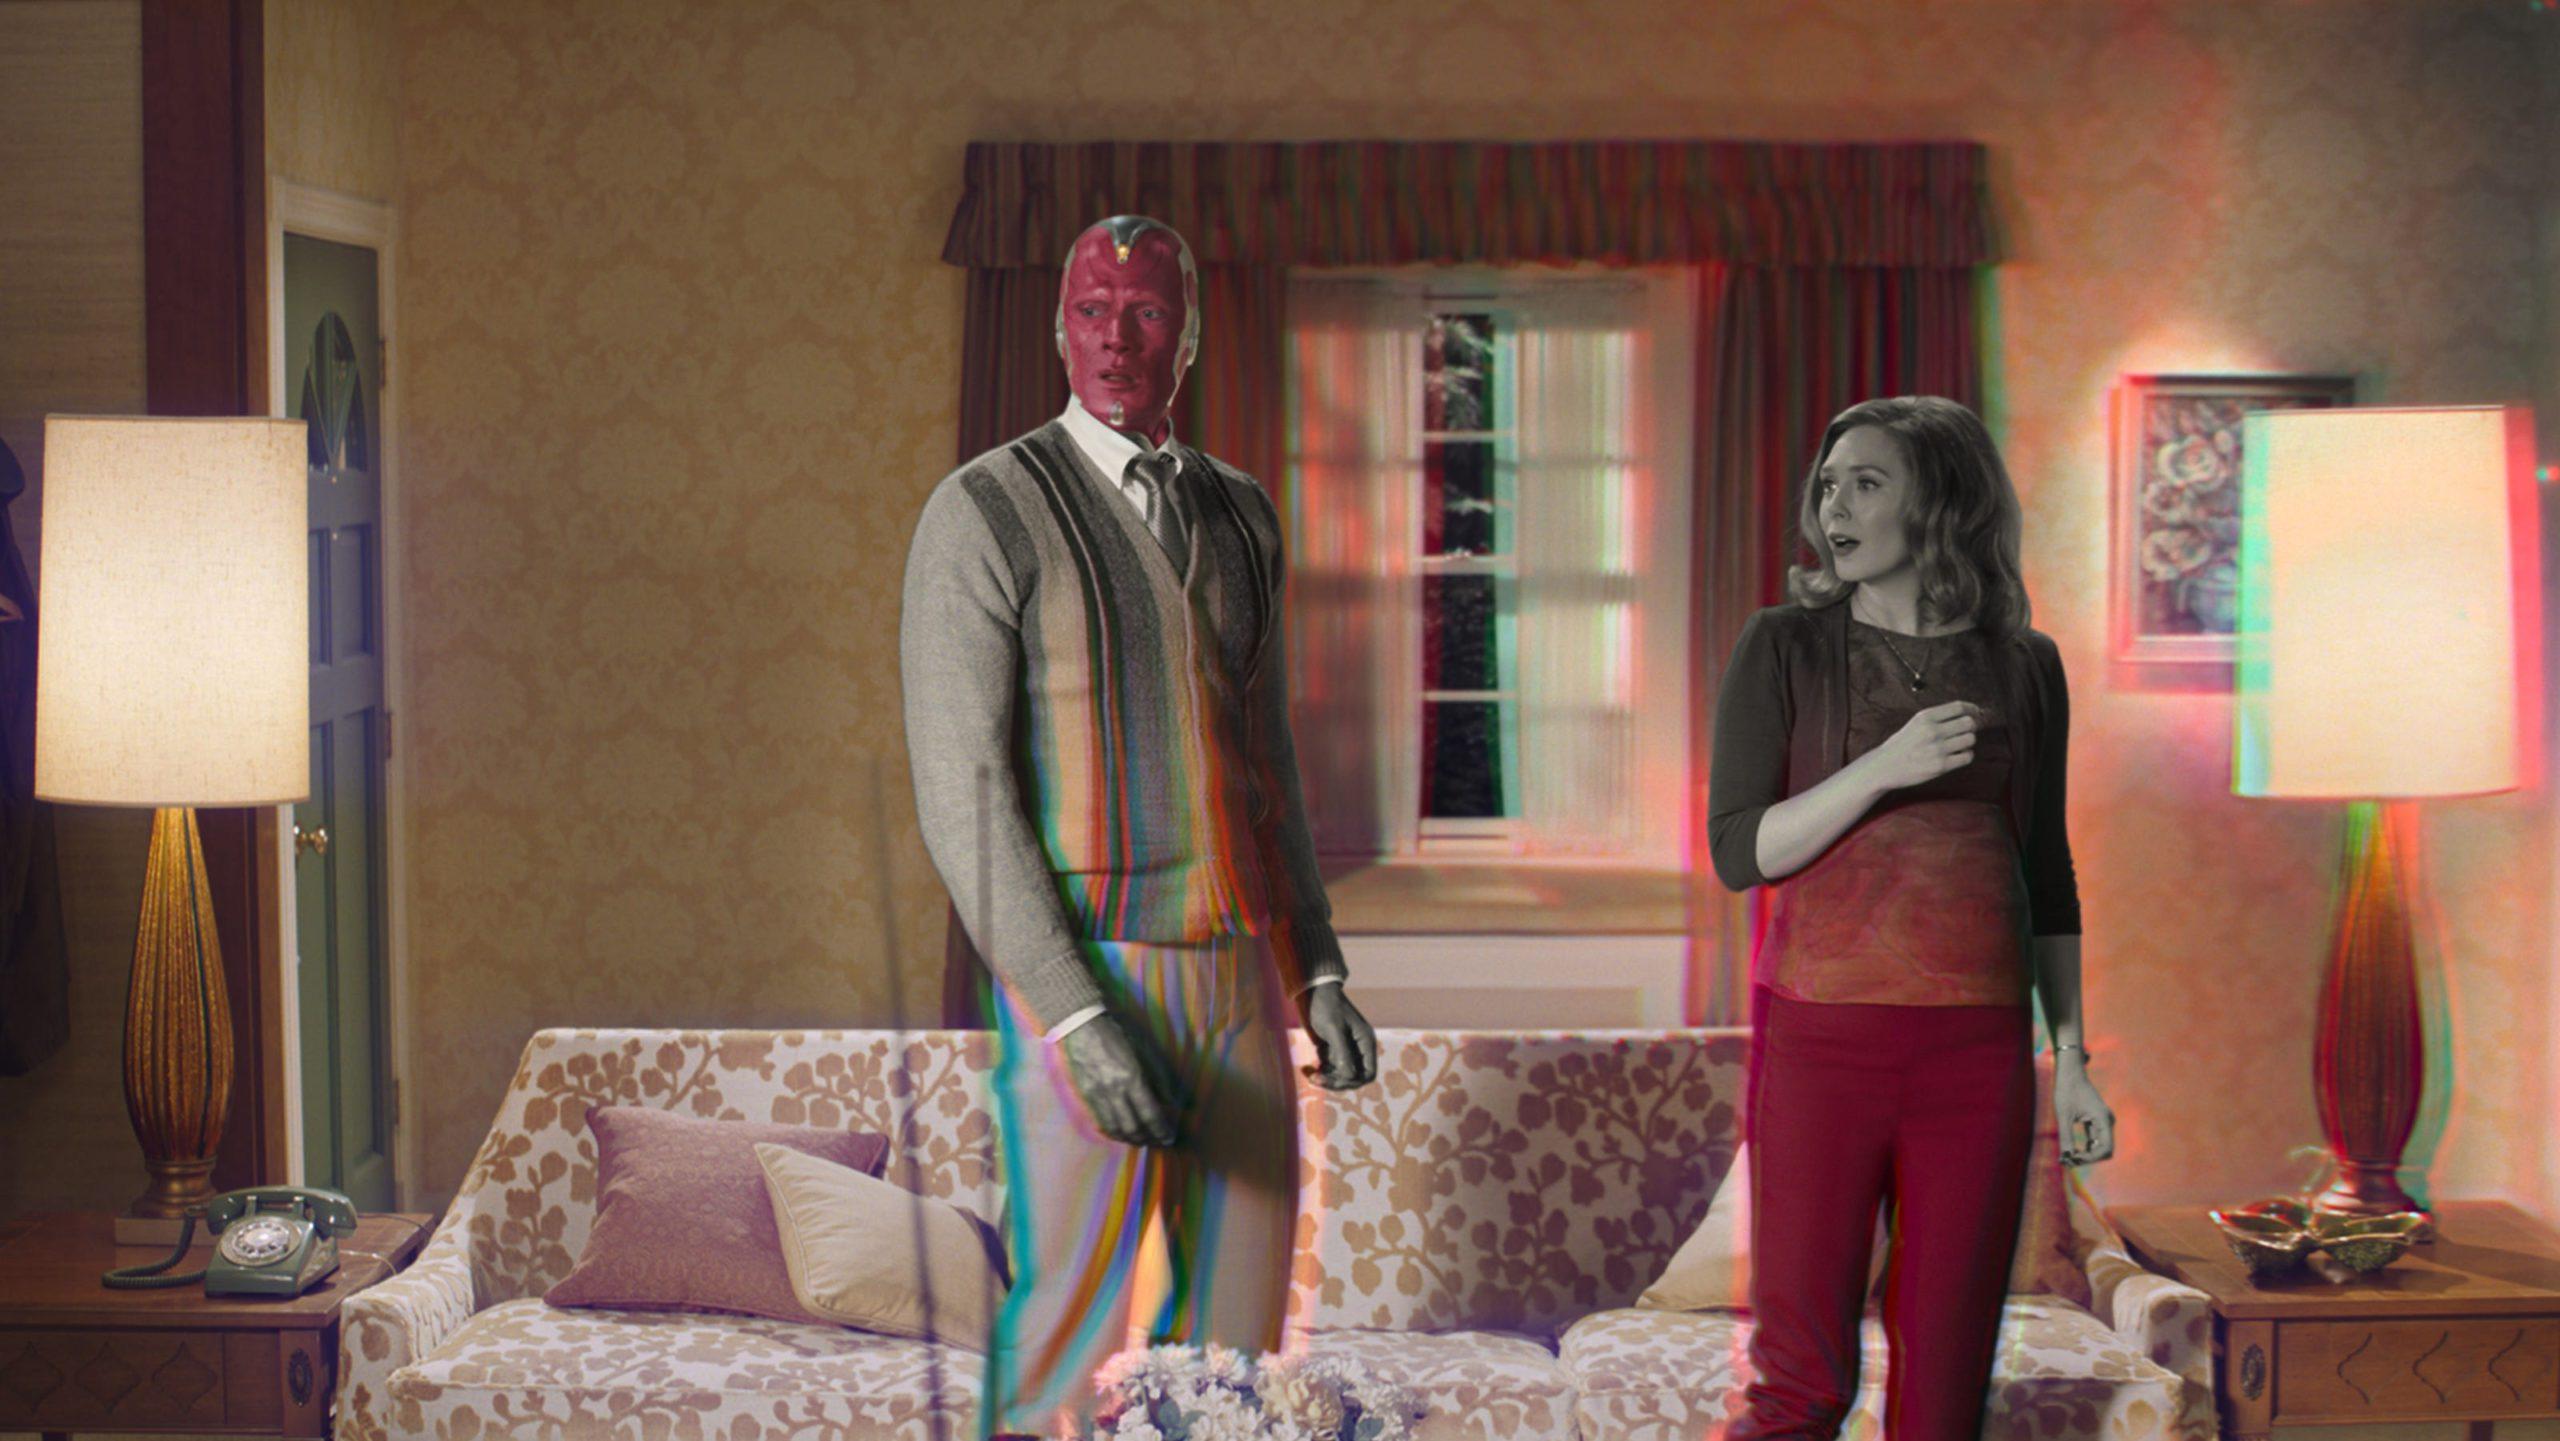 Wanda Vision episode 3 release date